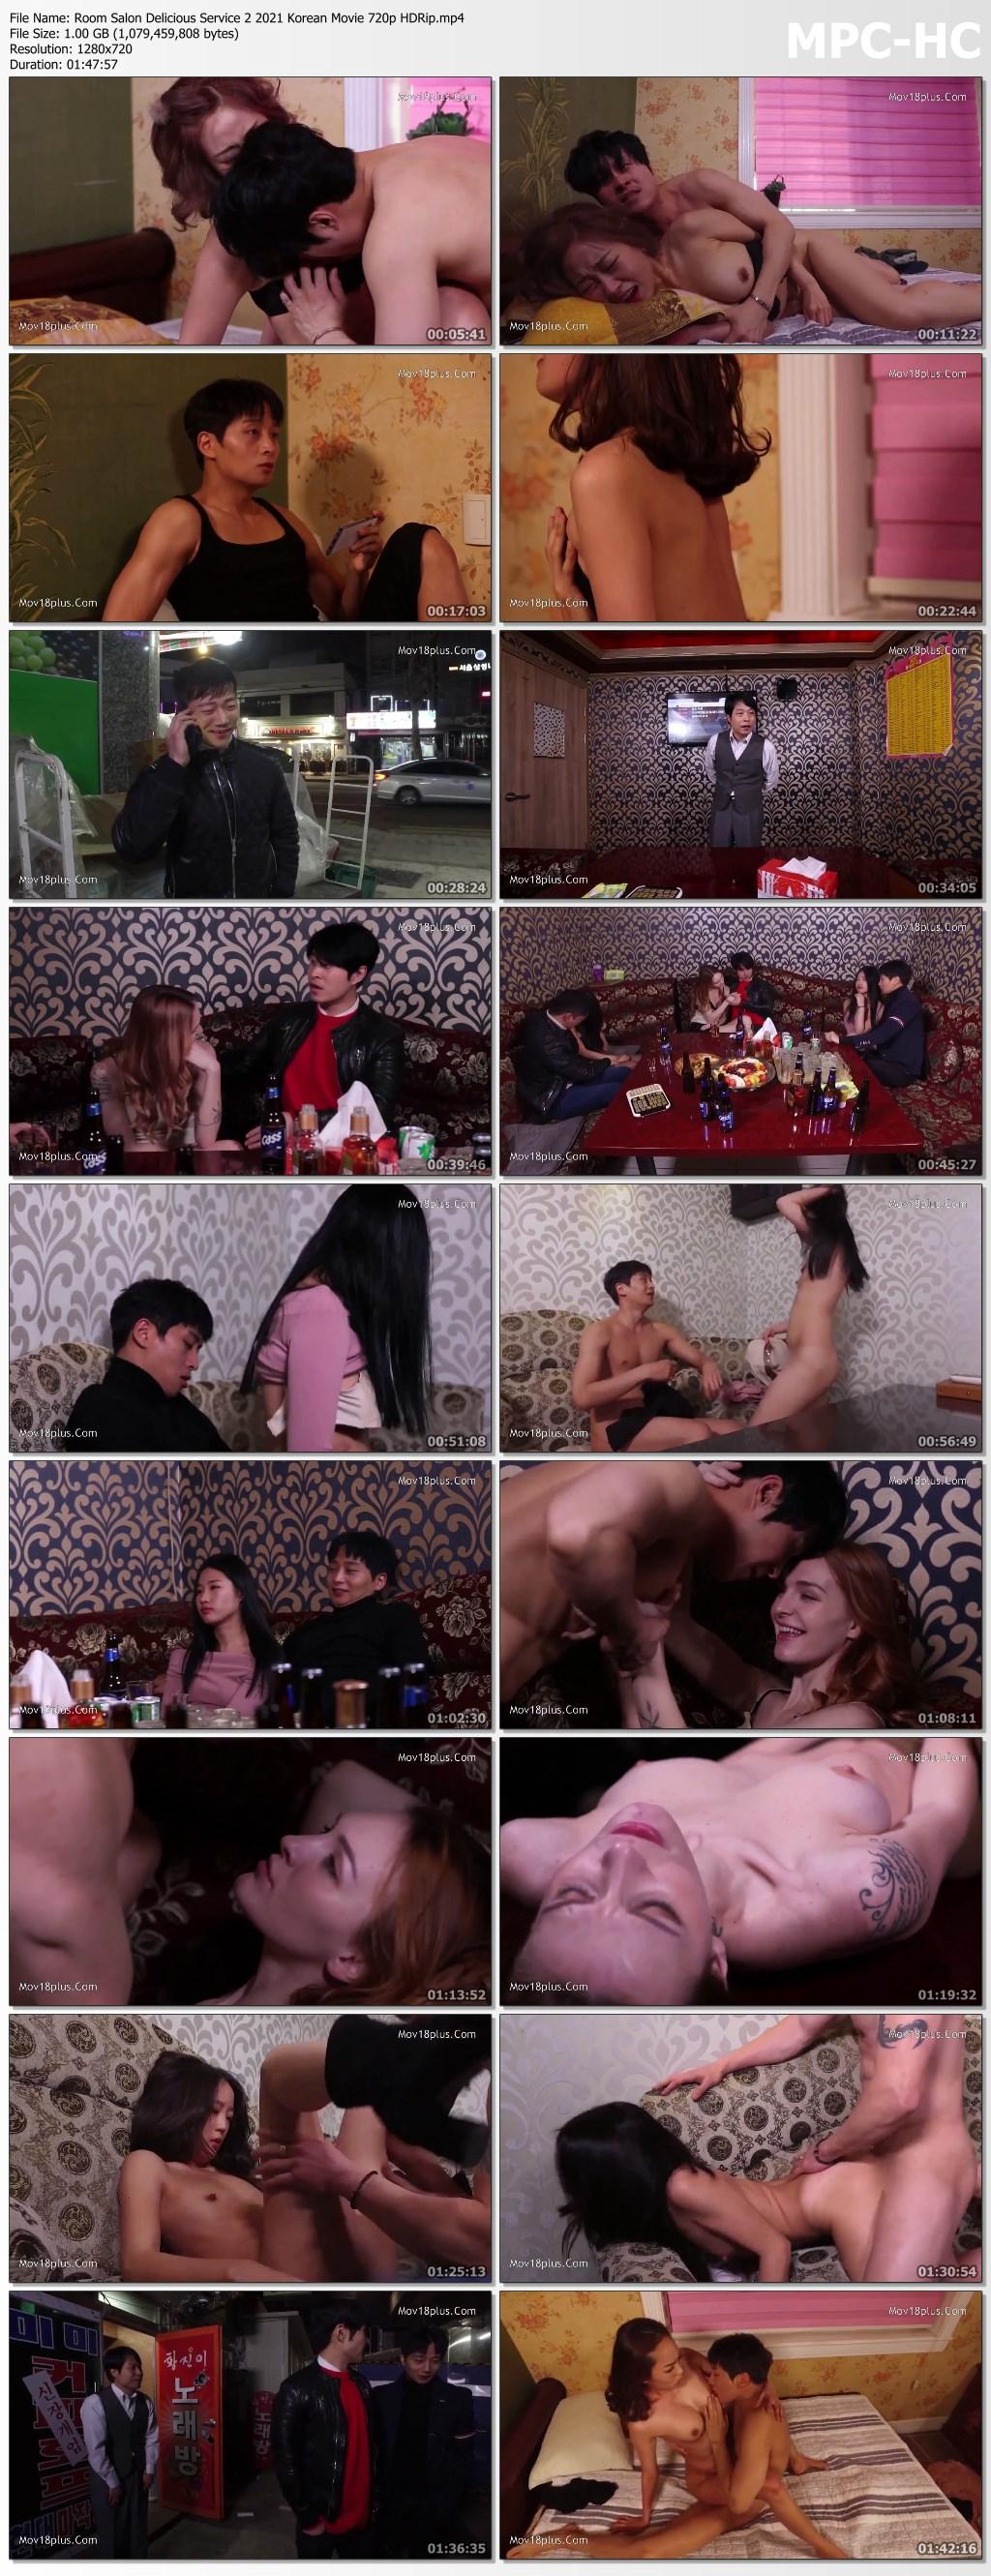 Room Salon Delicious Service 2 2021 Korean Movie 720p HDRip.mp4 thumbs